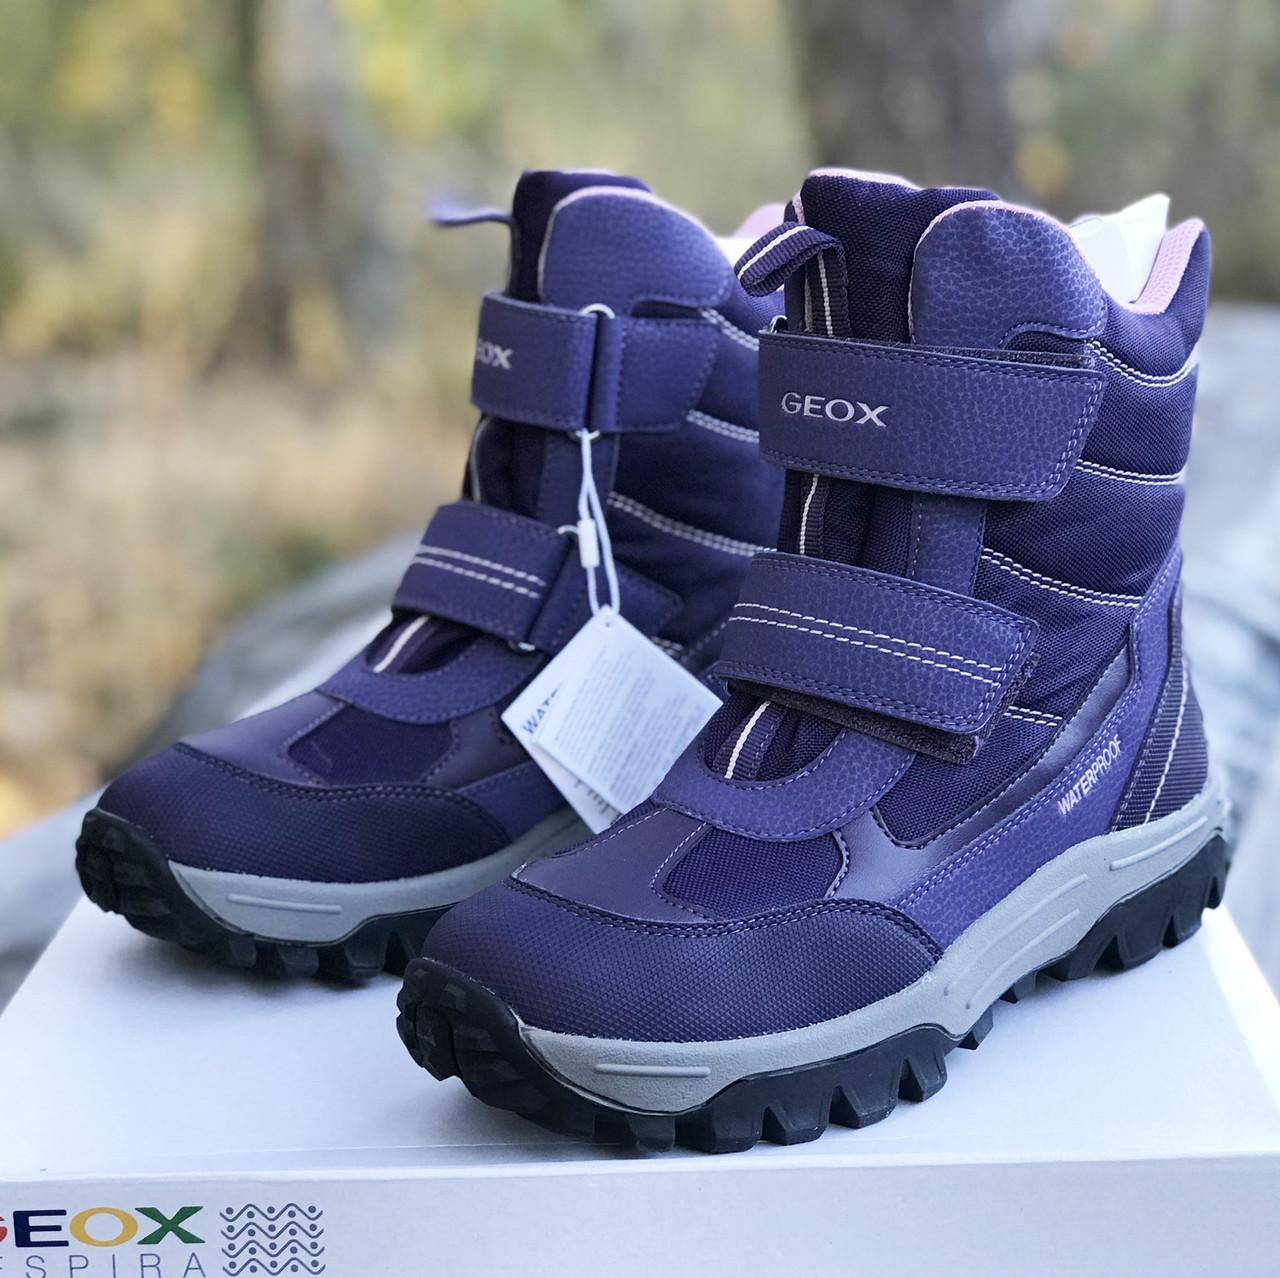 cb9f6d1e1 Зимние водонепроницаемые ботинки Geox (Италия) р 37. зимняя обувь джеокс -  Интернет-